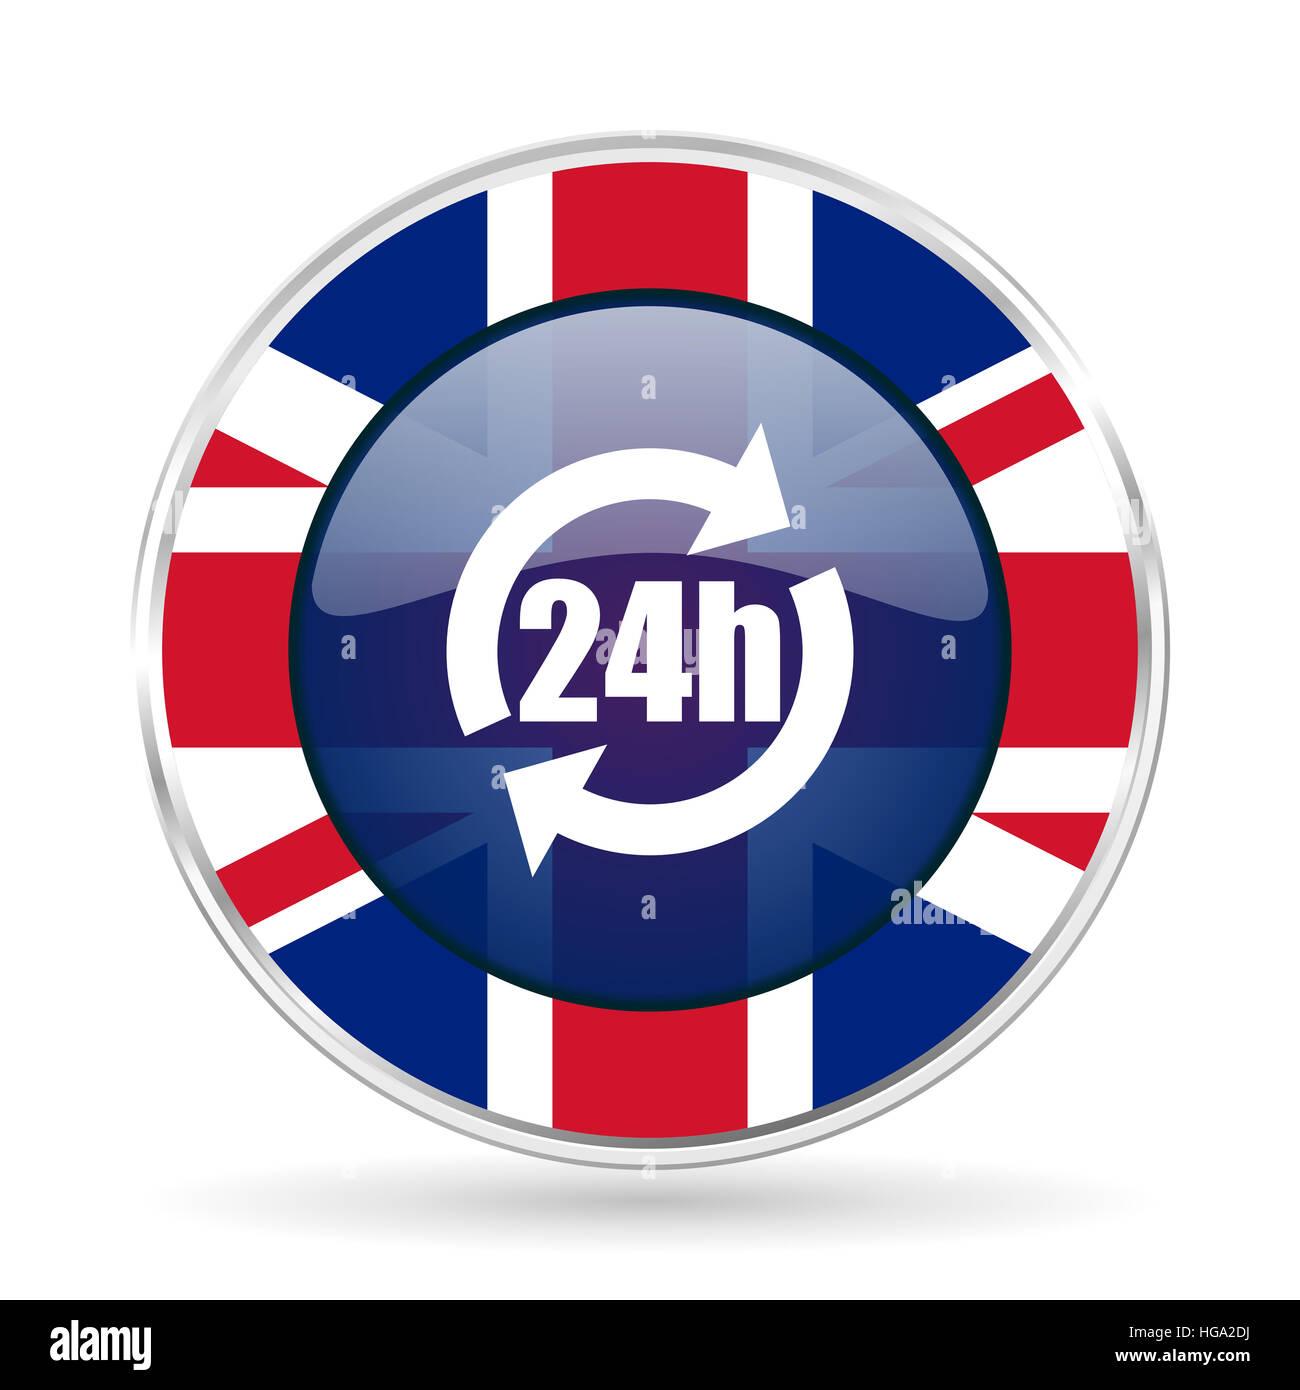 24h british design icon - round silver metallic border button with Great Britain flag - Stock Image